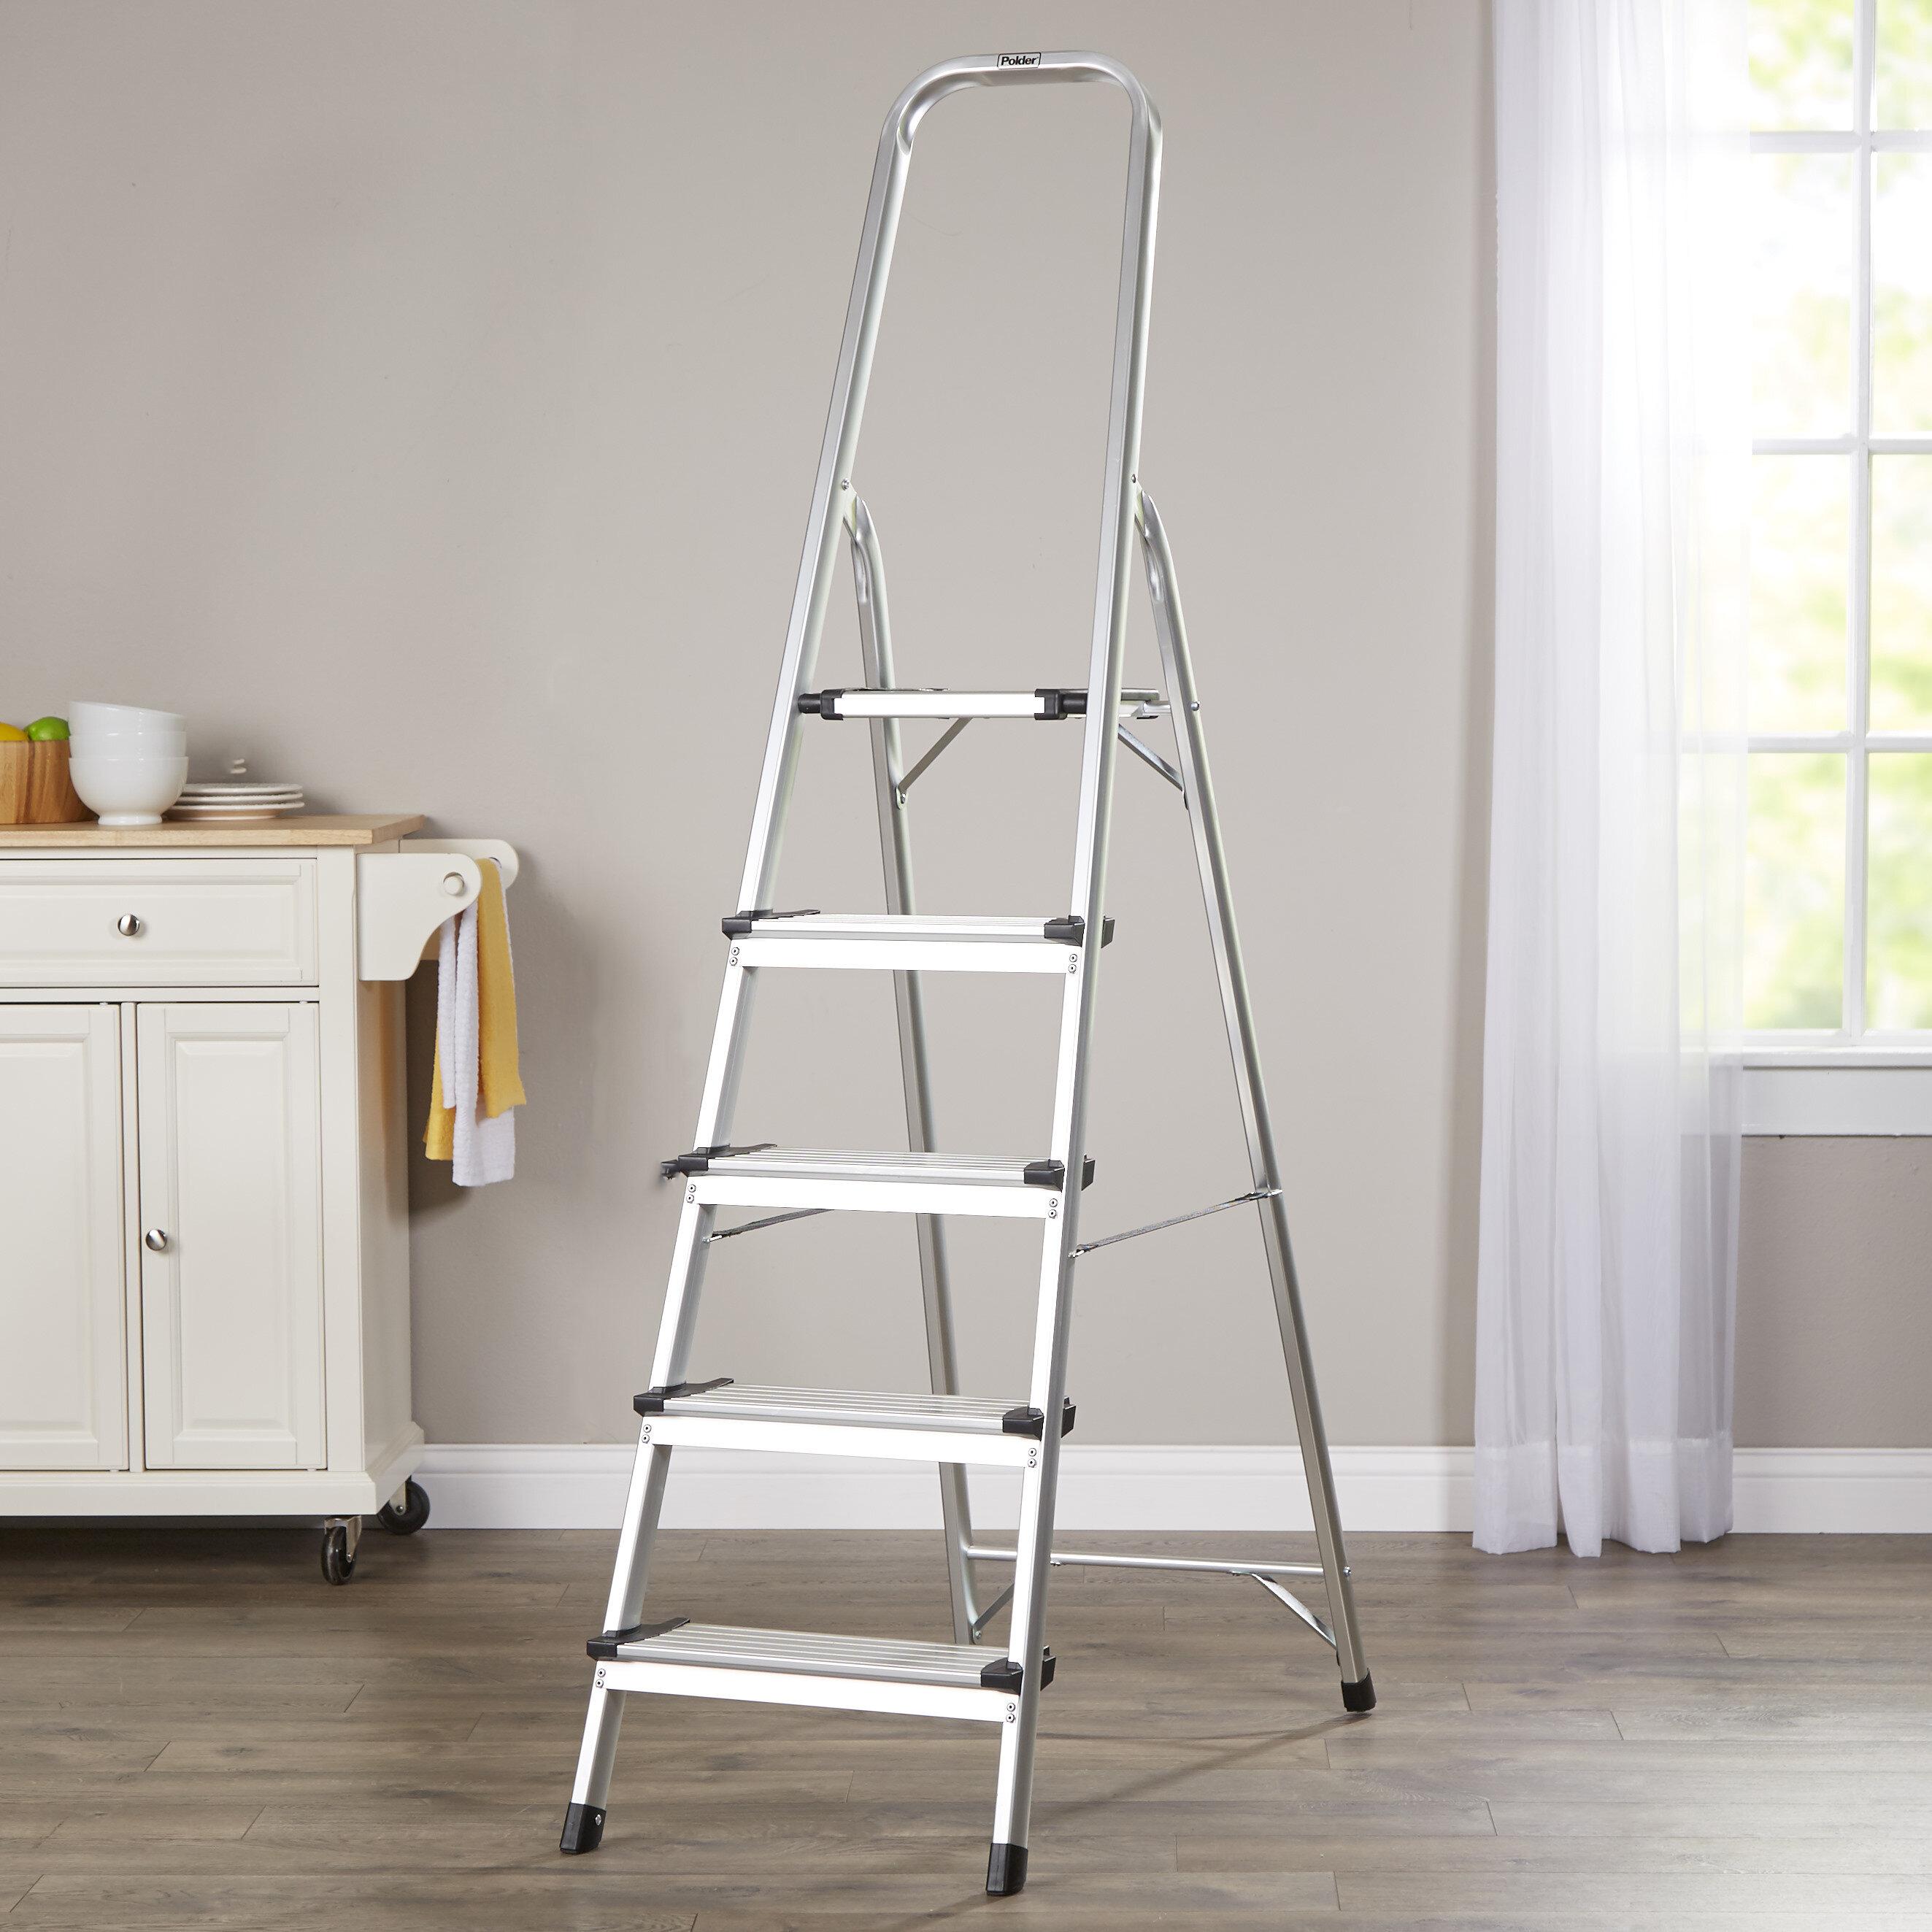 Wayfair Basics 5 Step Aluminum Ladder With 225 Lb Load Capacity Reviews